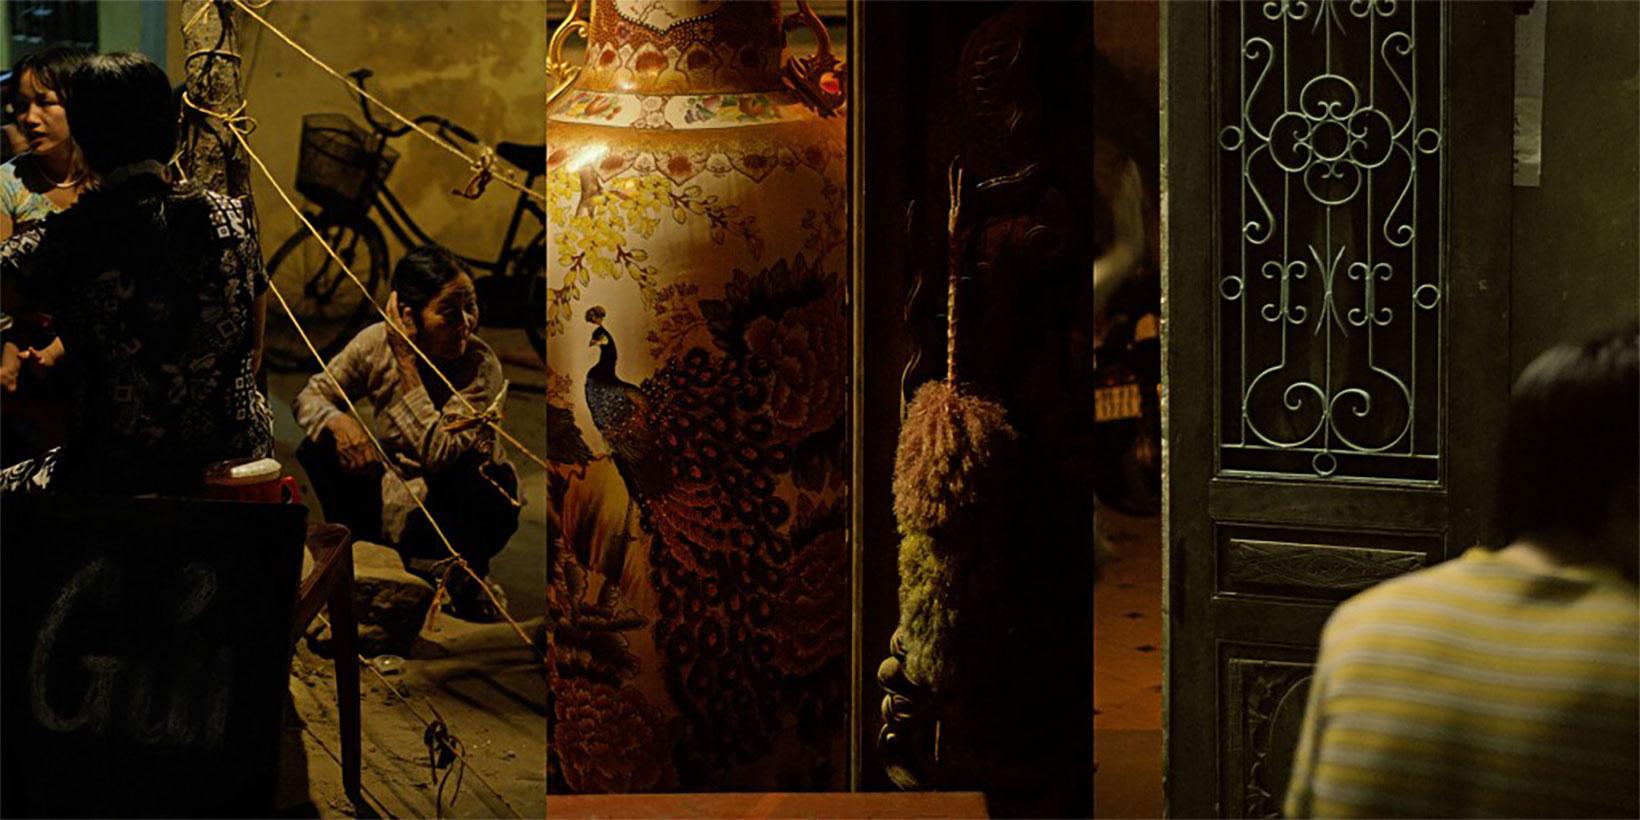 Sherman Ong's Series HanoiHaiku, Monsoon and Spurious Landscapes